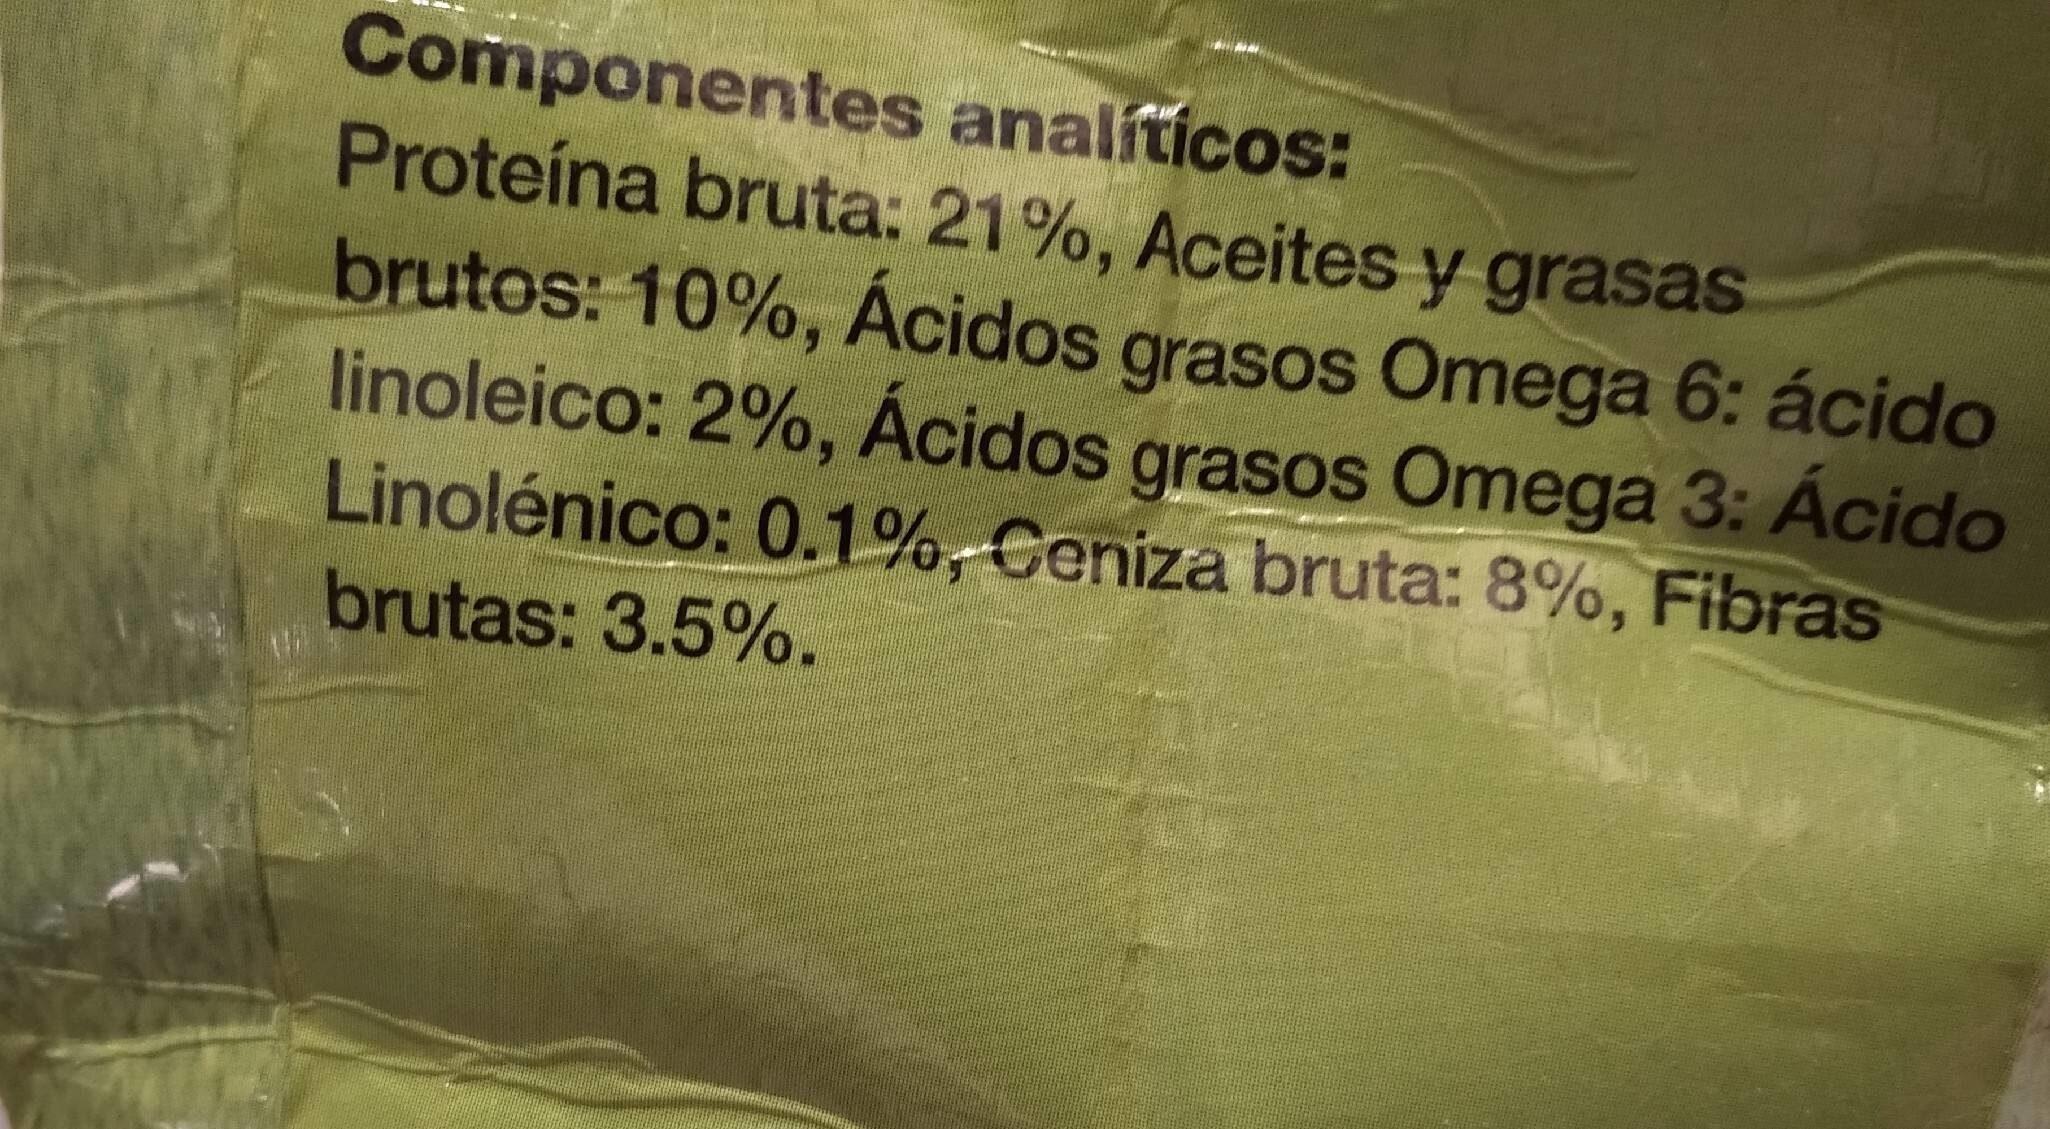 Friskies Alimento Perro Vitafit Complete - Nutrition facts - fr